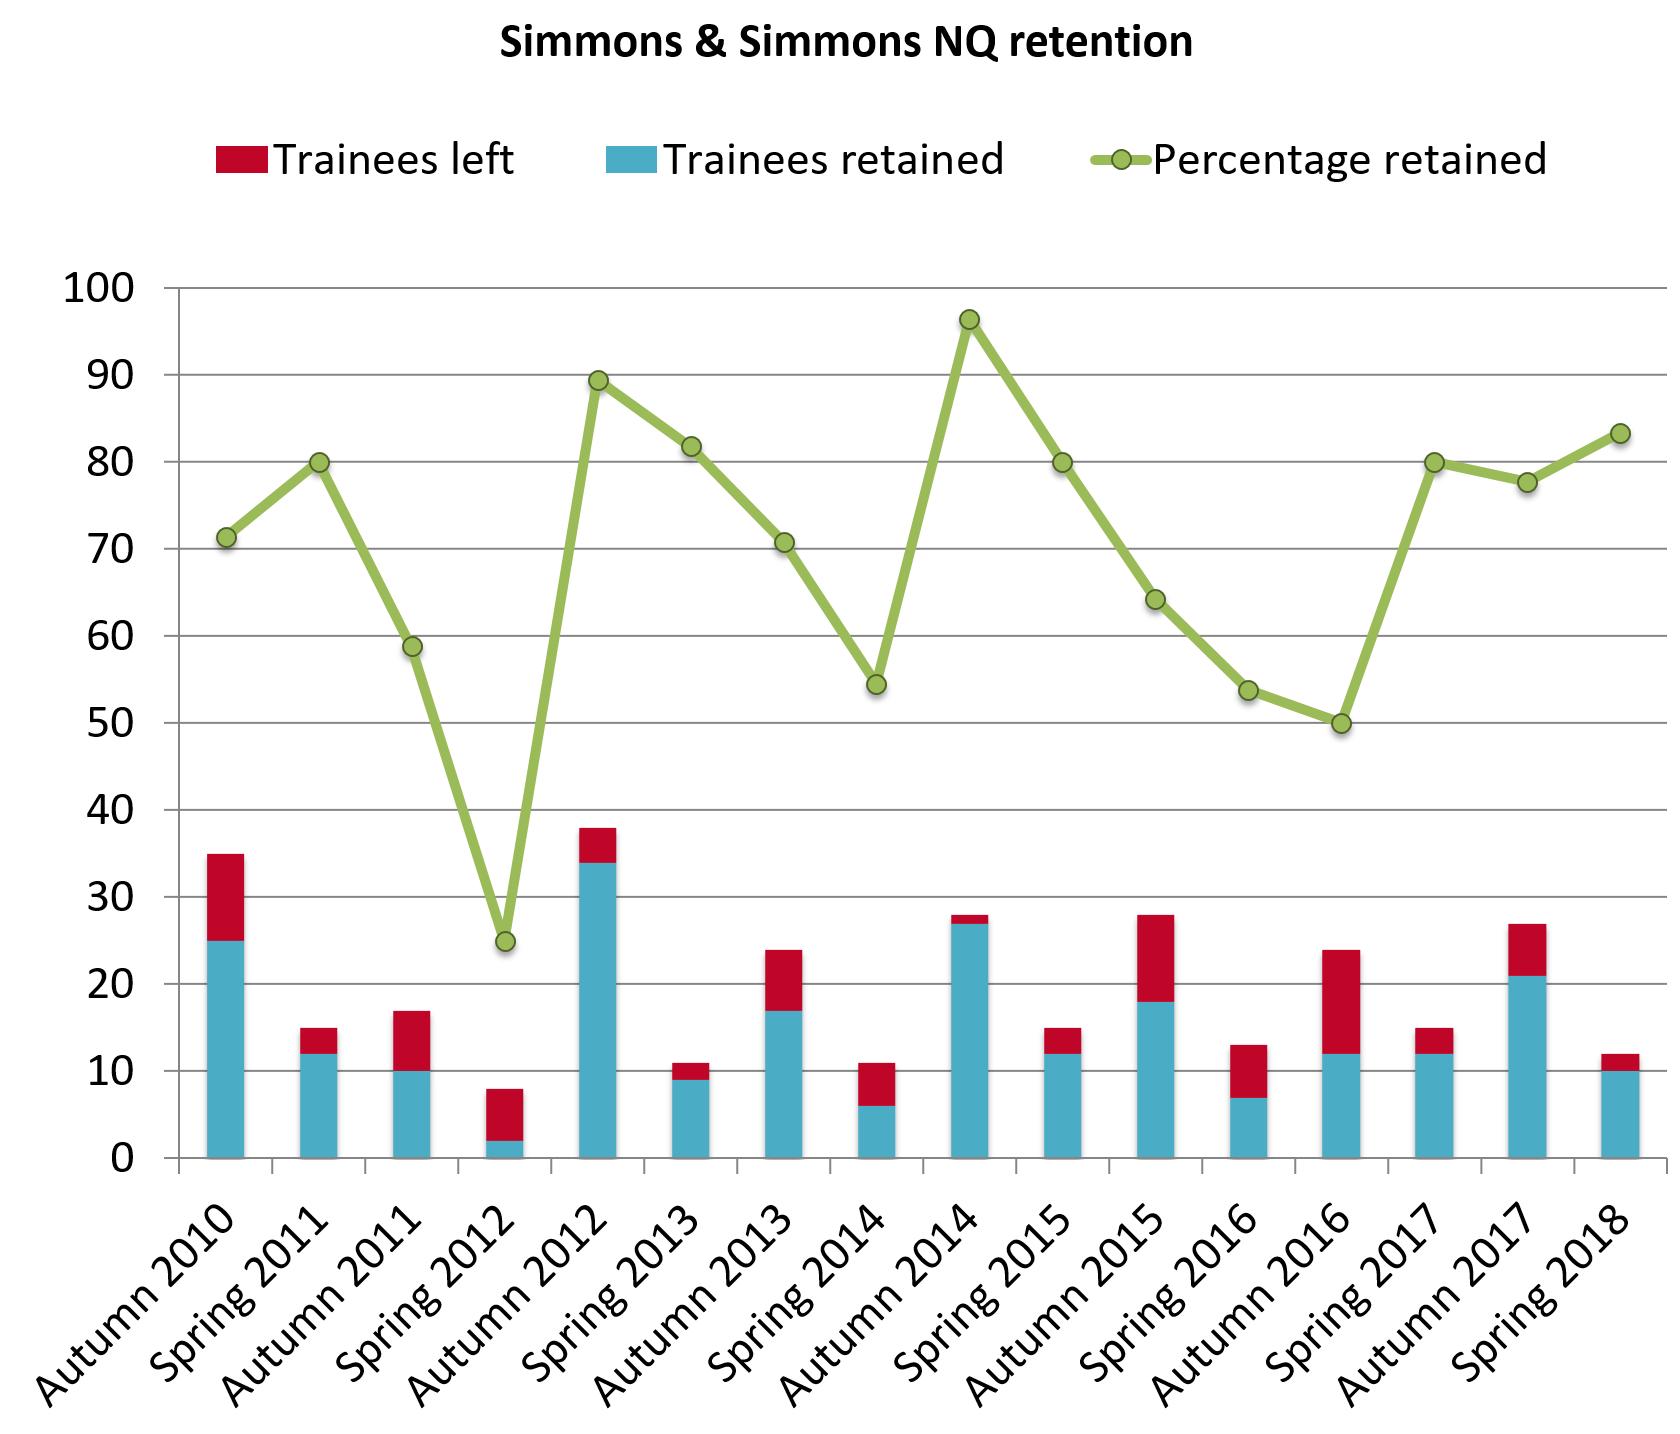 Simmons retention 2018